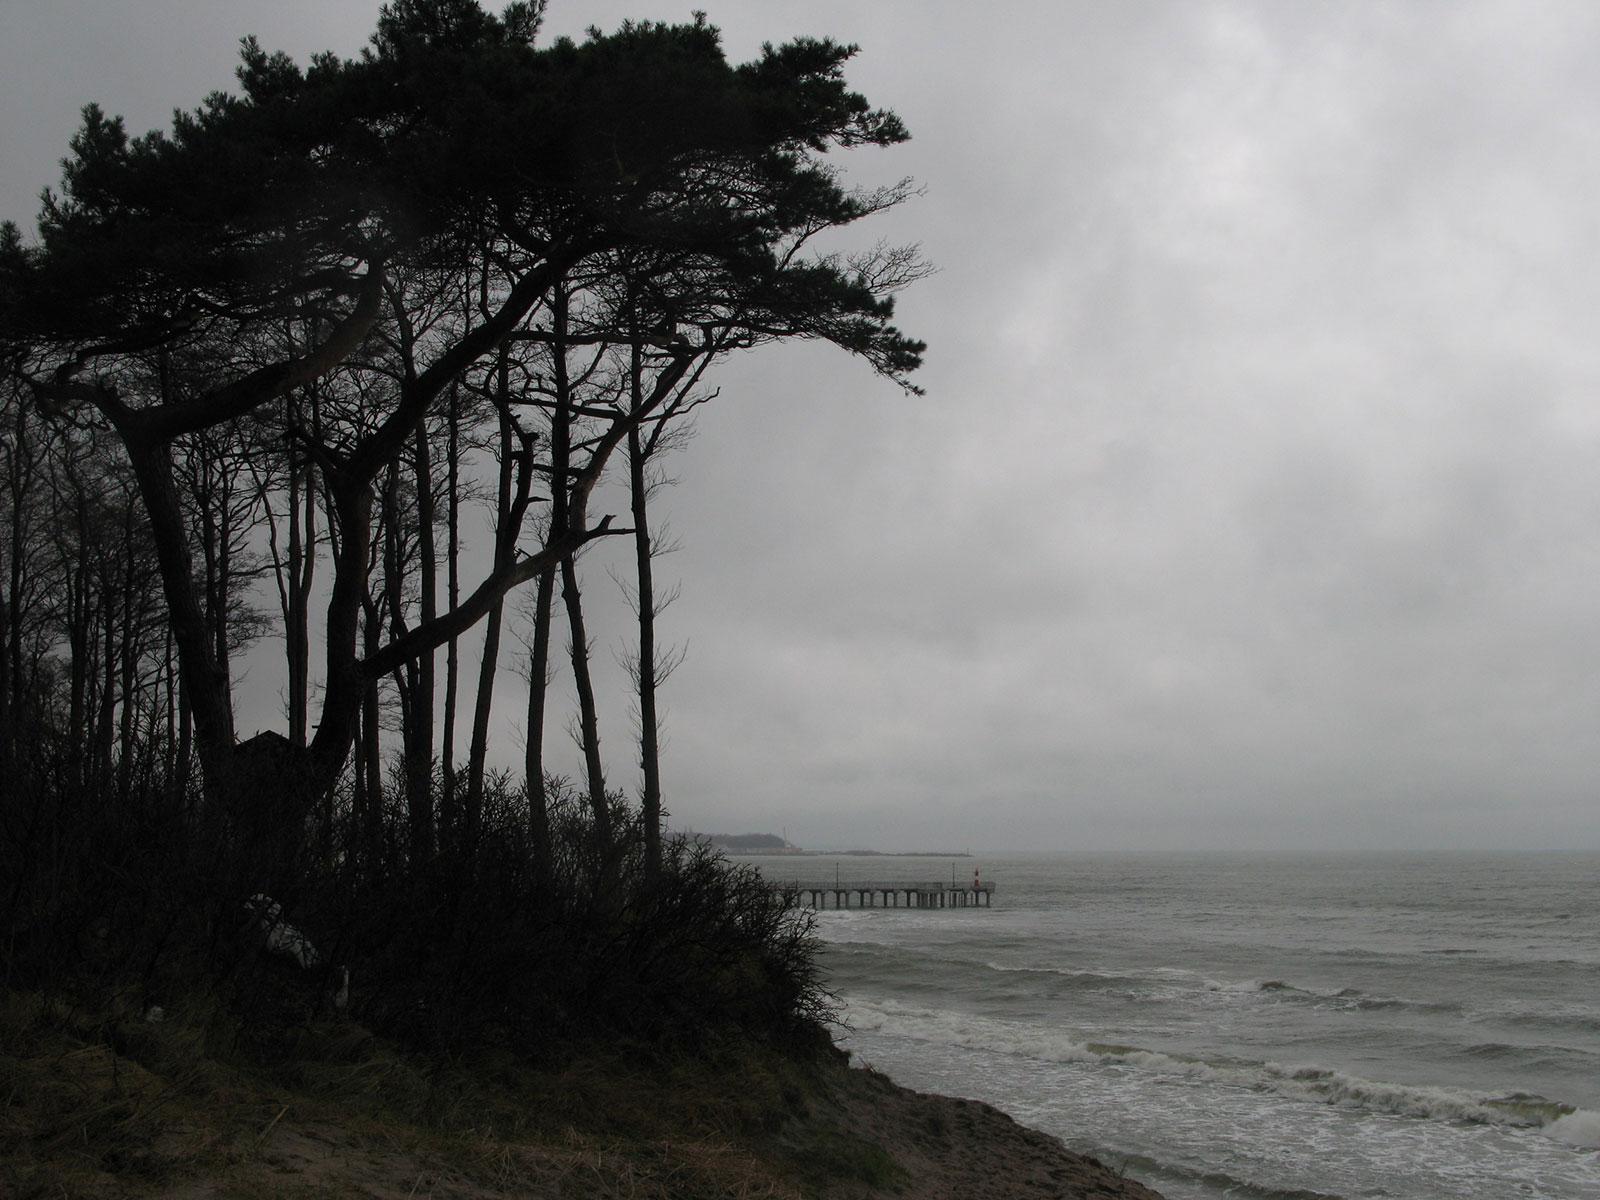 Балтийское море в Калининградской области